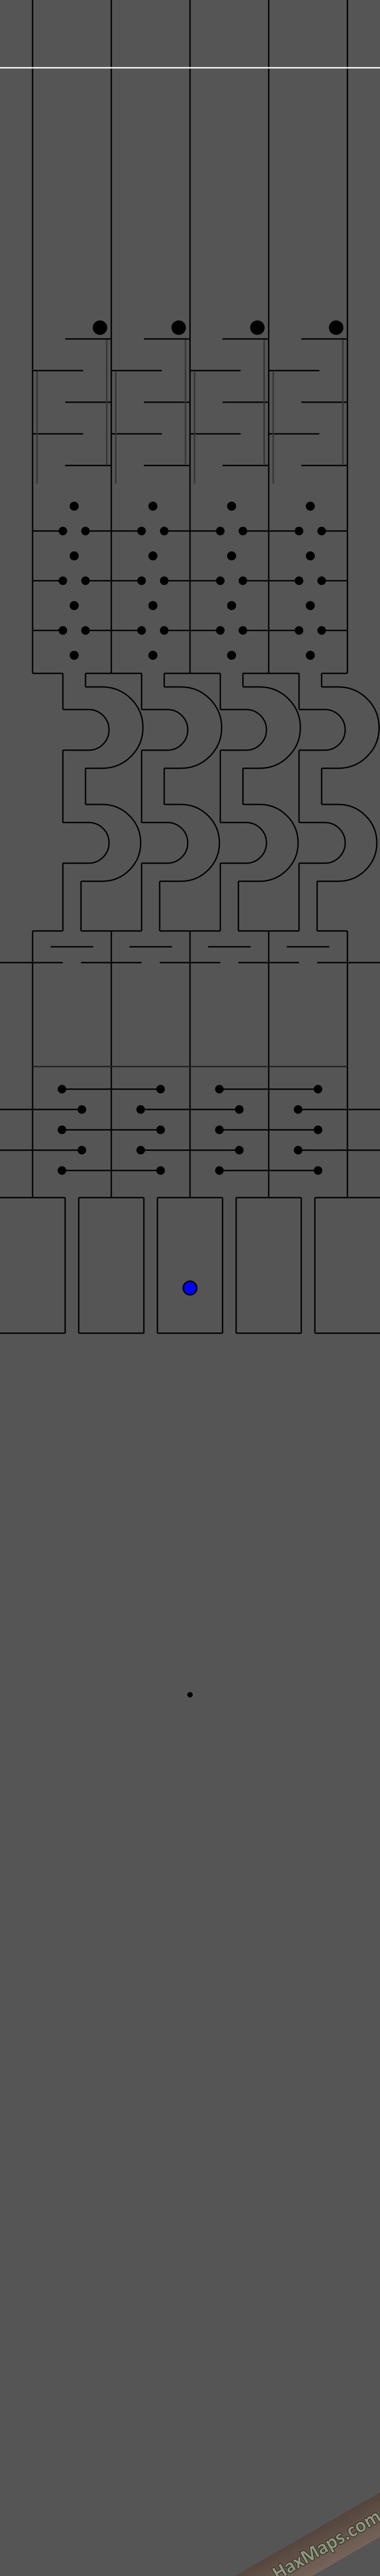 hax ball maps | 4 way race